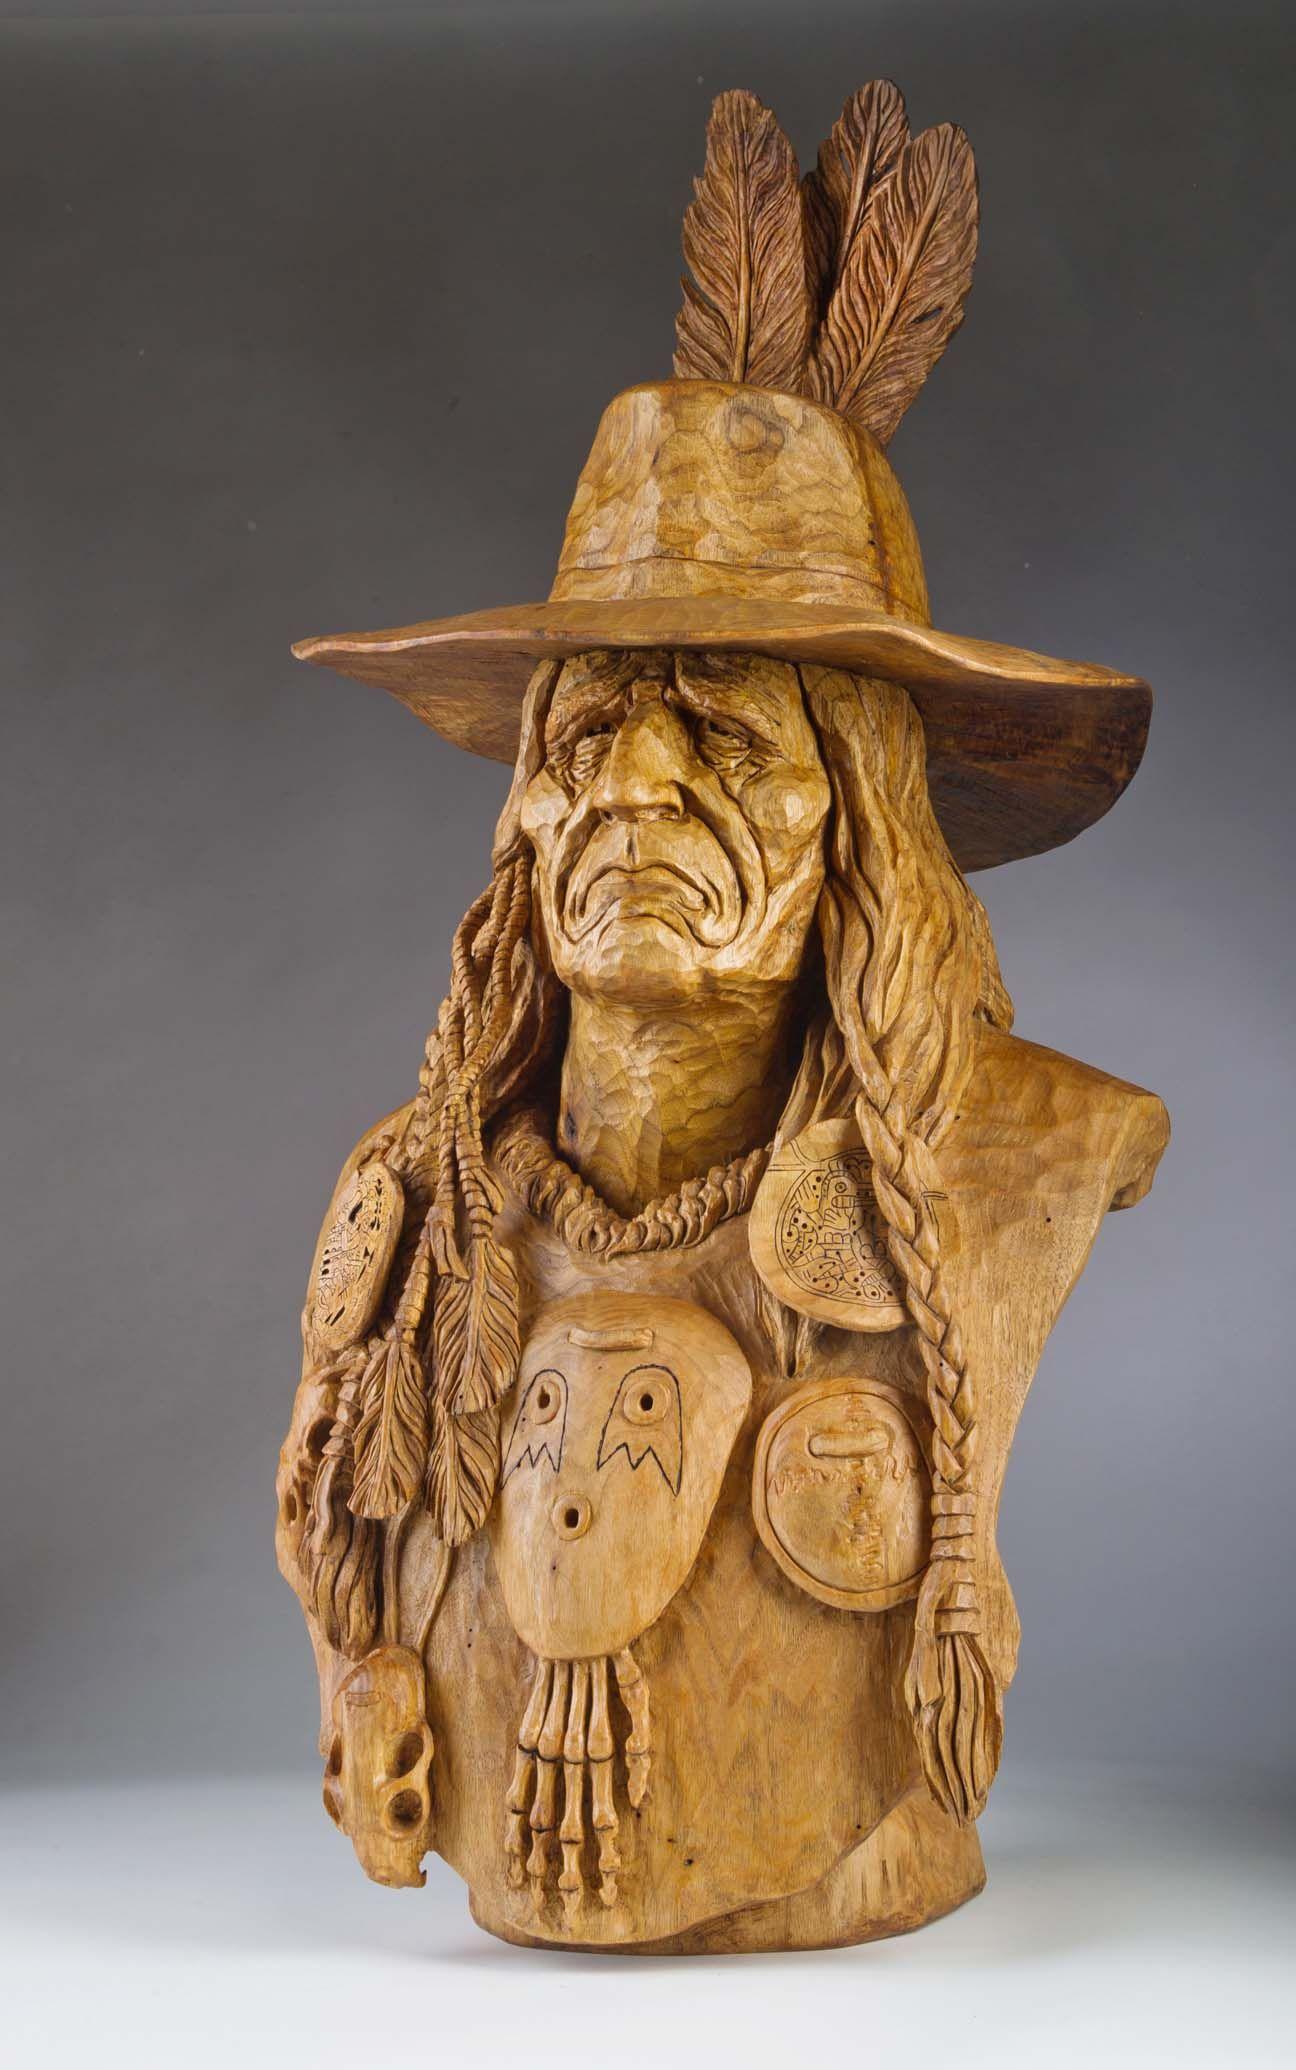 Quot skin walker carved by vic hood wood carvings